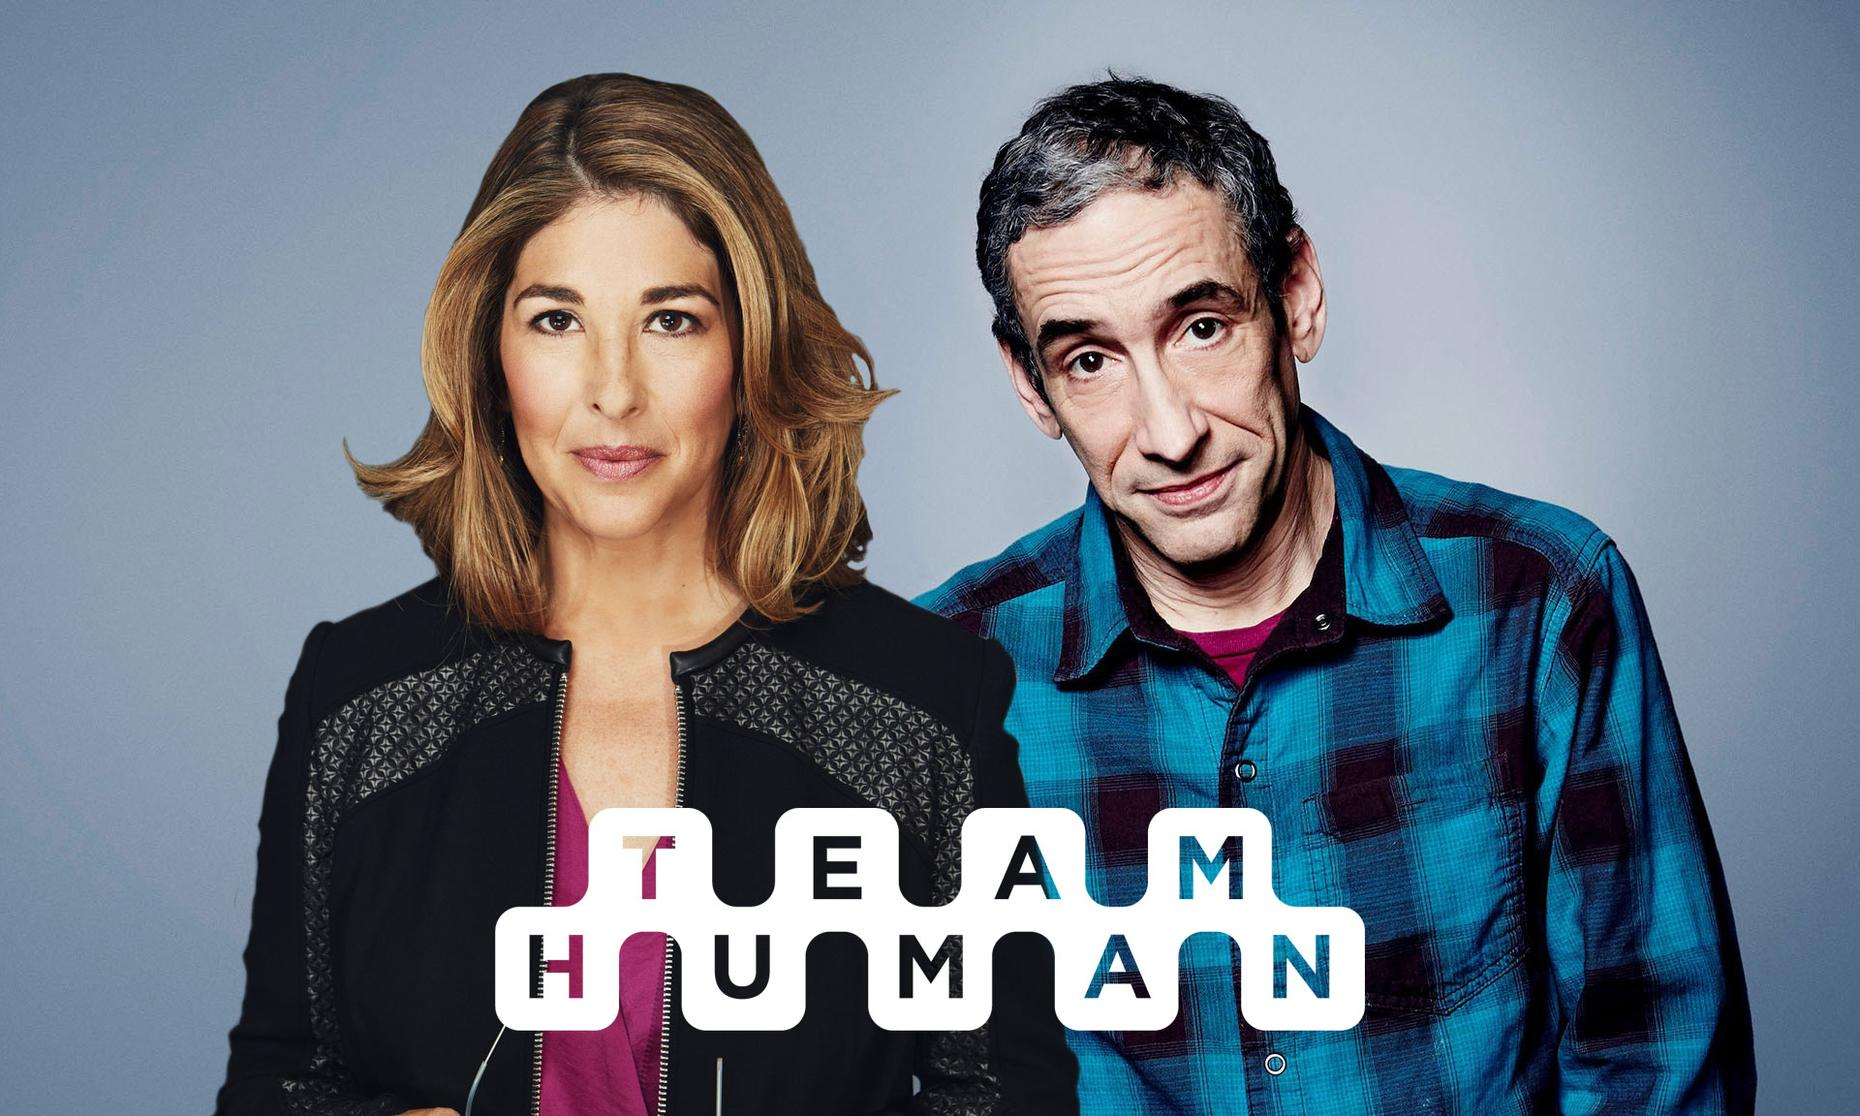 Team Human with Naomi Klein and Douglas Rushkoff